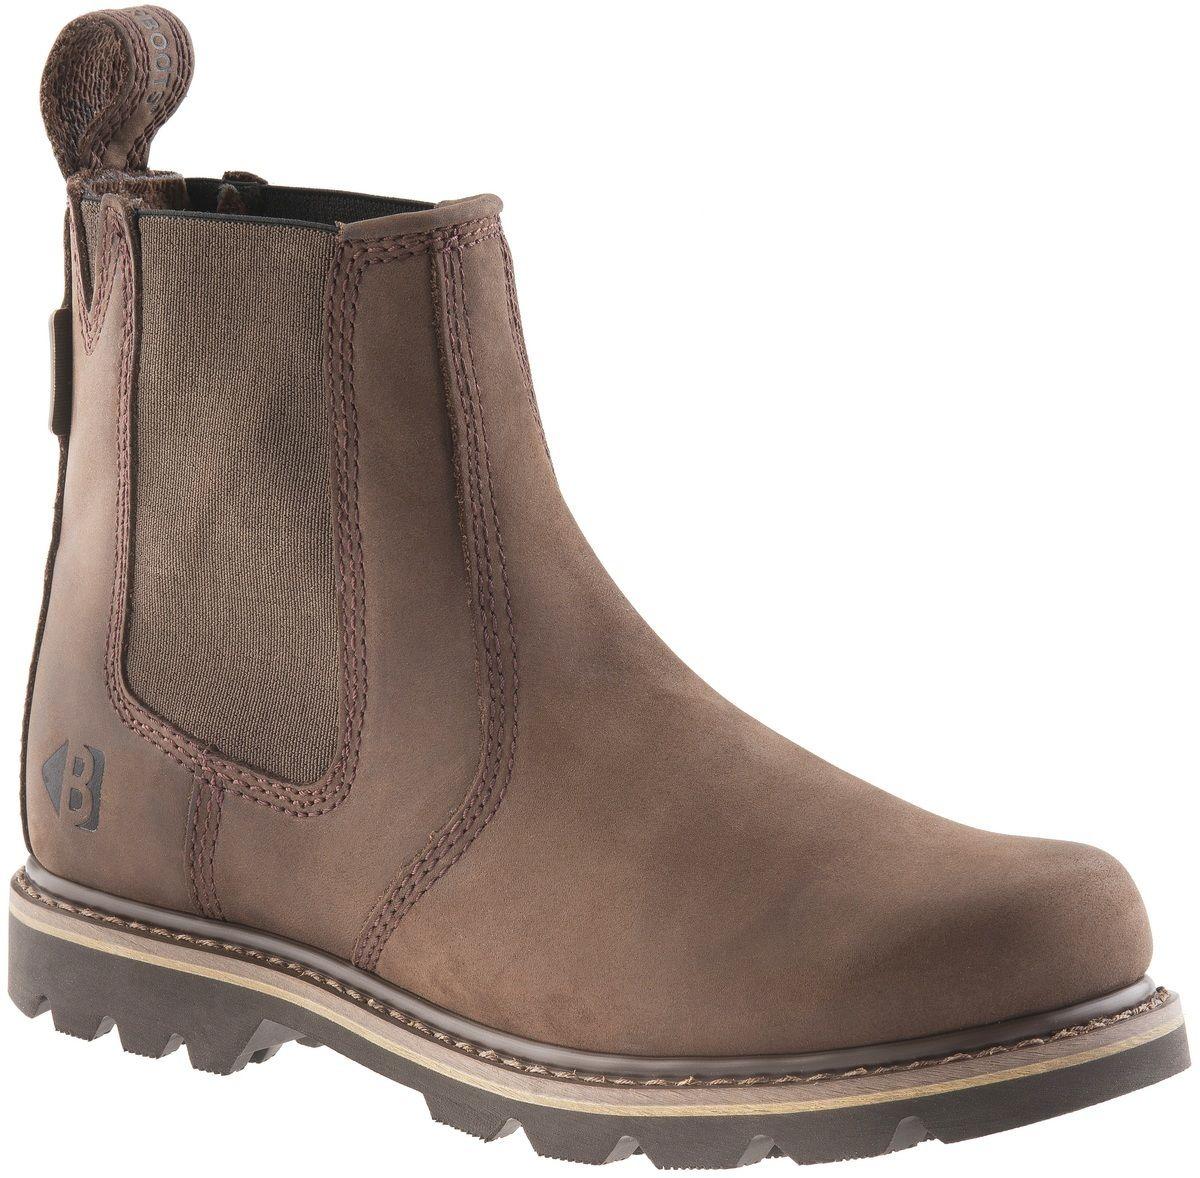 Buckler B1400 Leder Buckflex chocolate oily Leder B1400 non-safety dealer boot Größe 6-13 f53a79